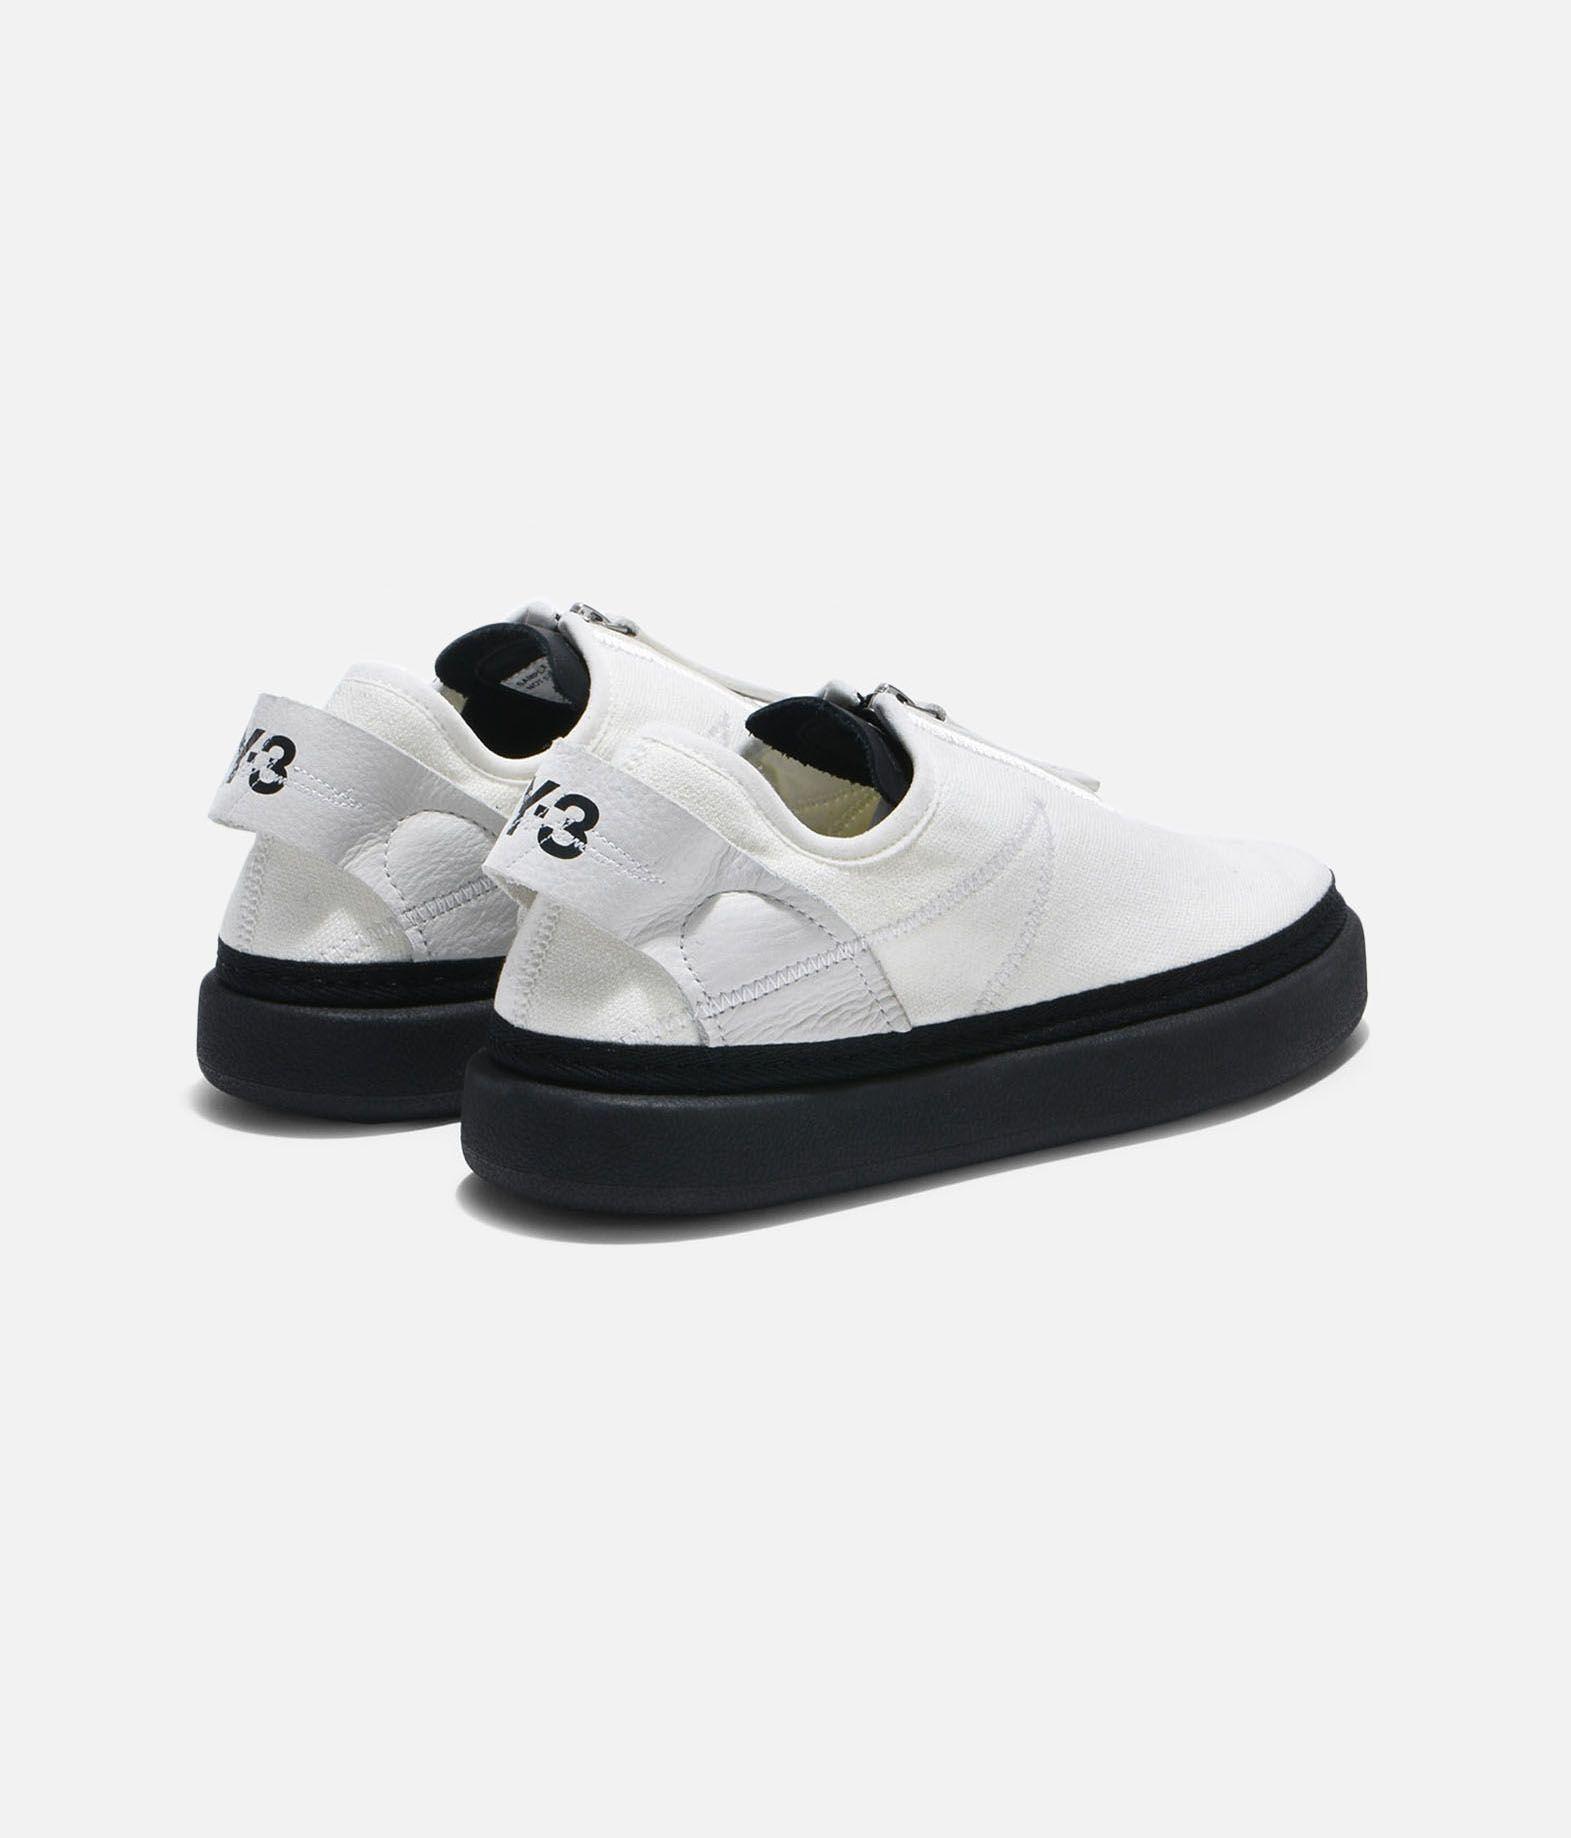 d855a9e376ef7 Y-3 Y-3 Comfort Zip Sneakers Woman c